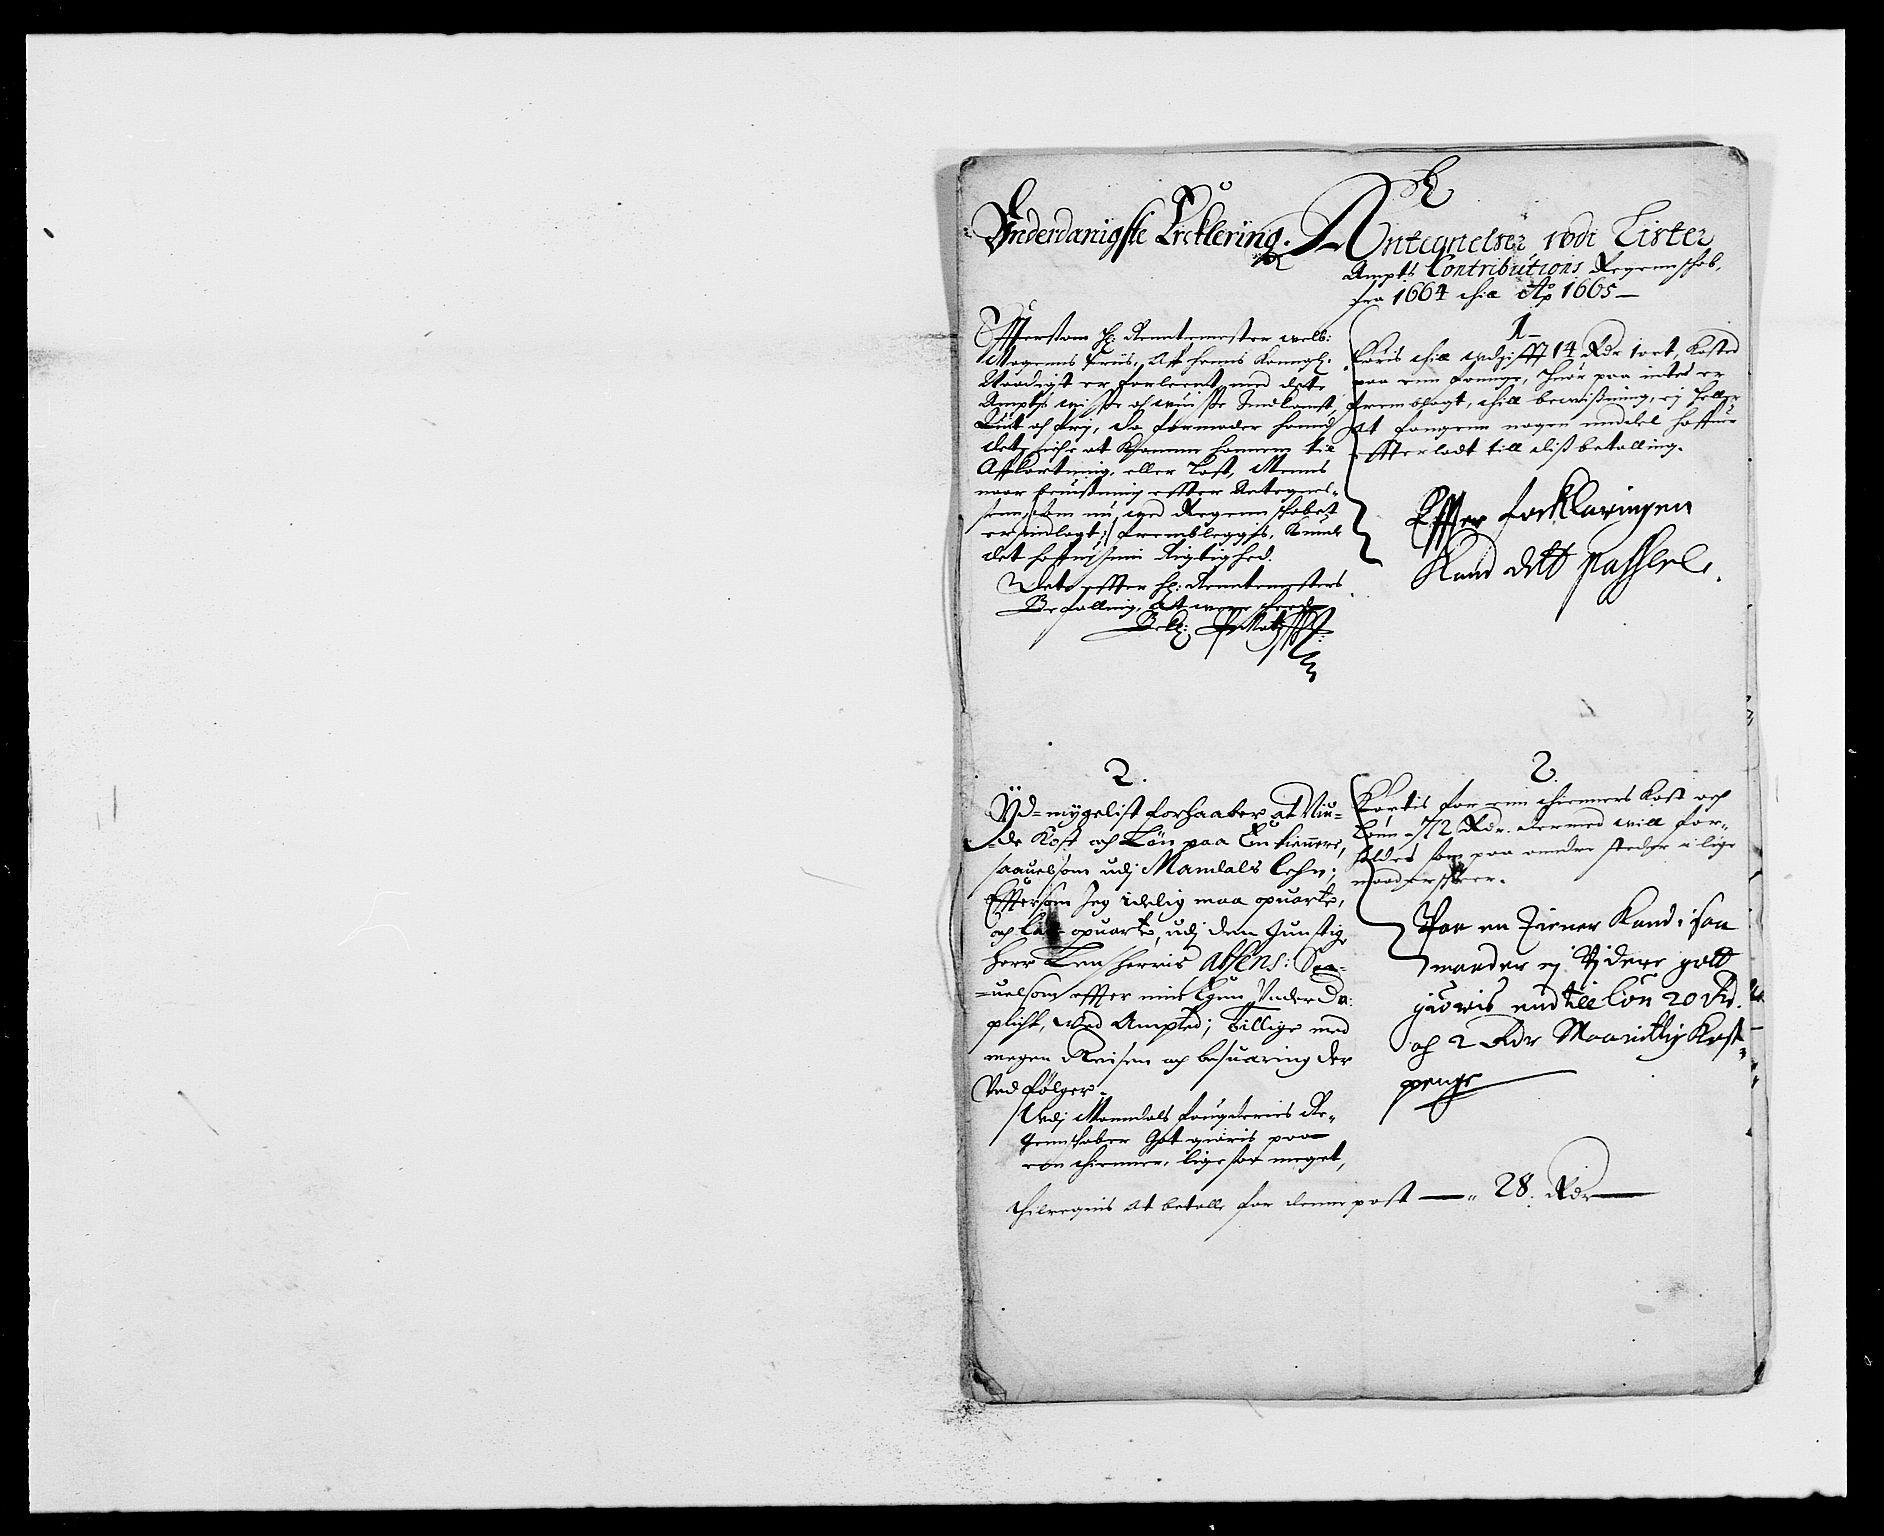 RA, Rentekammeret inntil 1814, Reviderte regnskaper, Fogderegnskap, R41/L2523: Fogderegnskap Lista, 1663-1664, s. 411